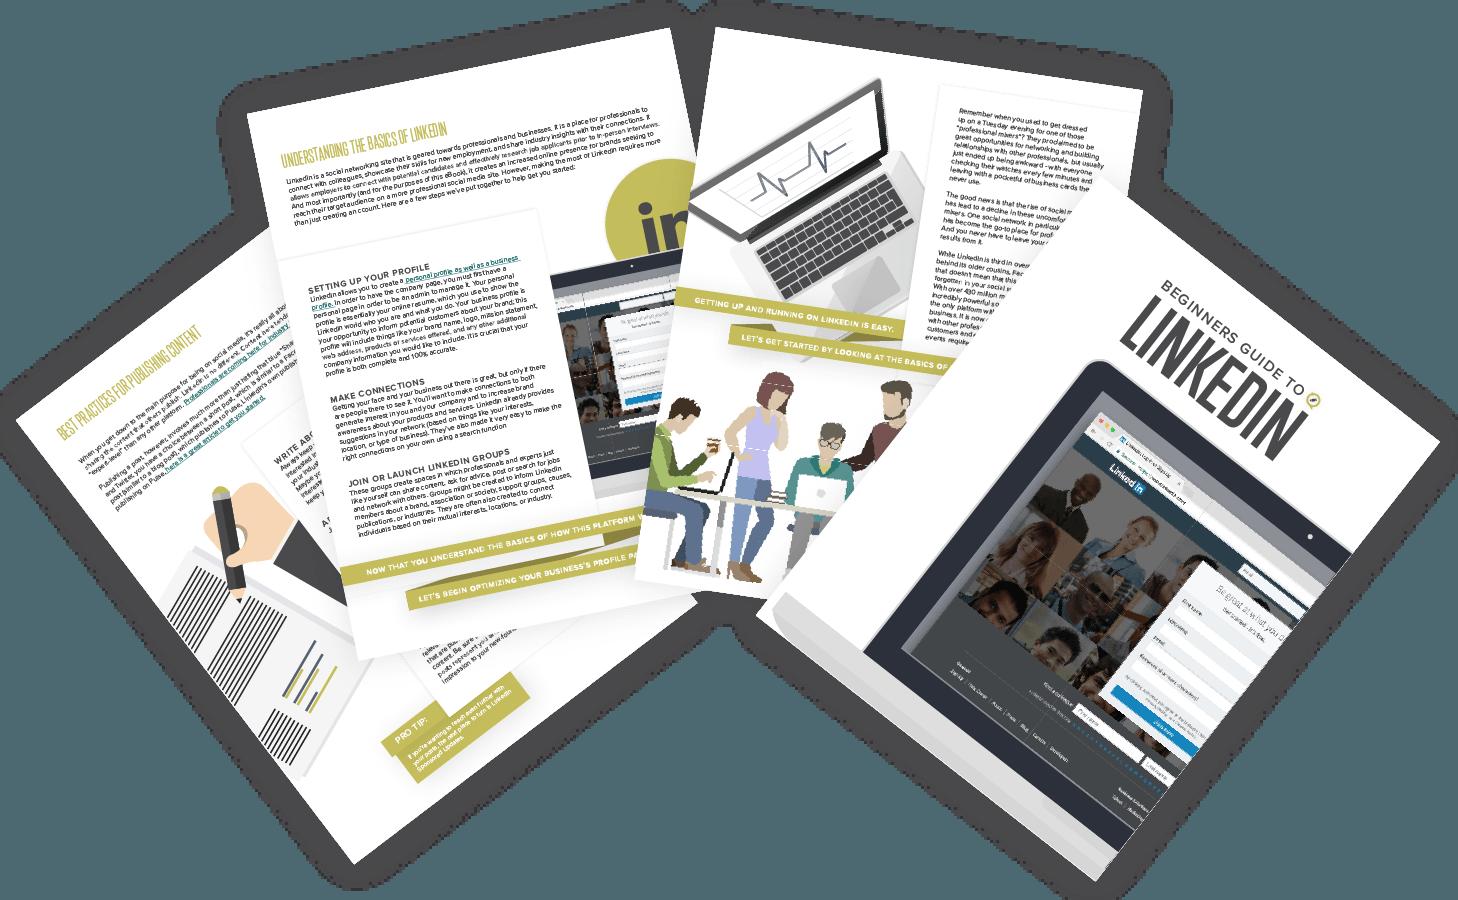 Beginners_Guide_to_Linkedin_LP